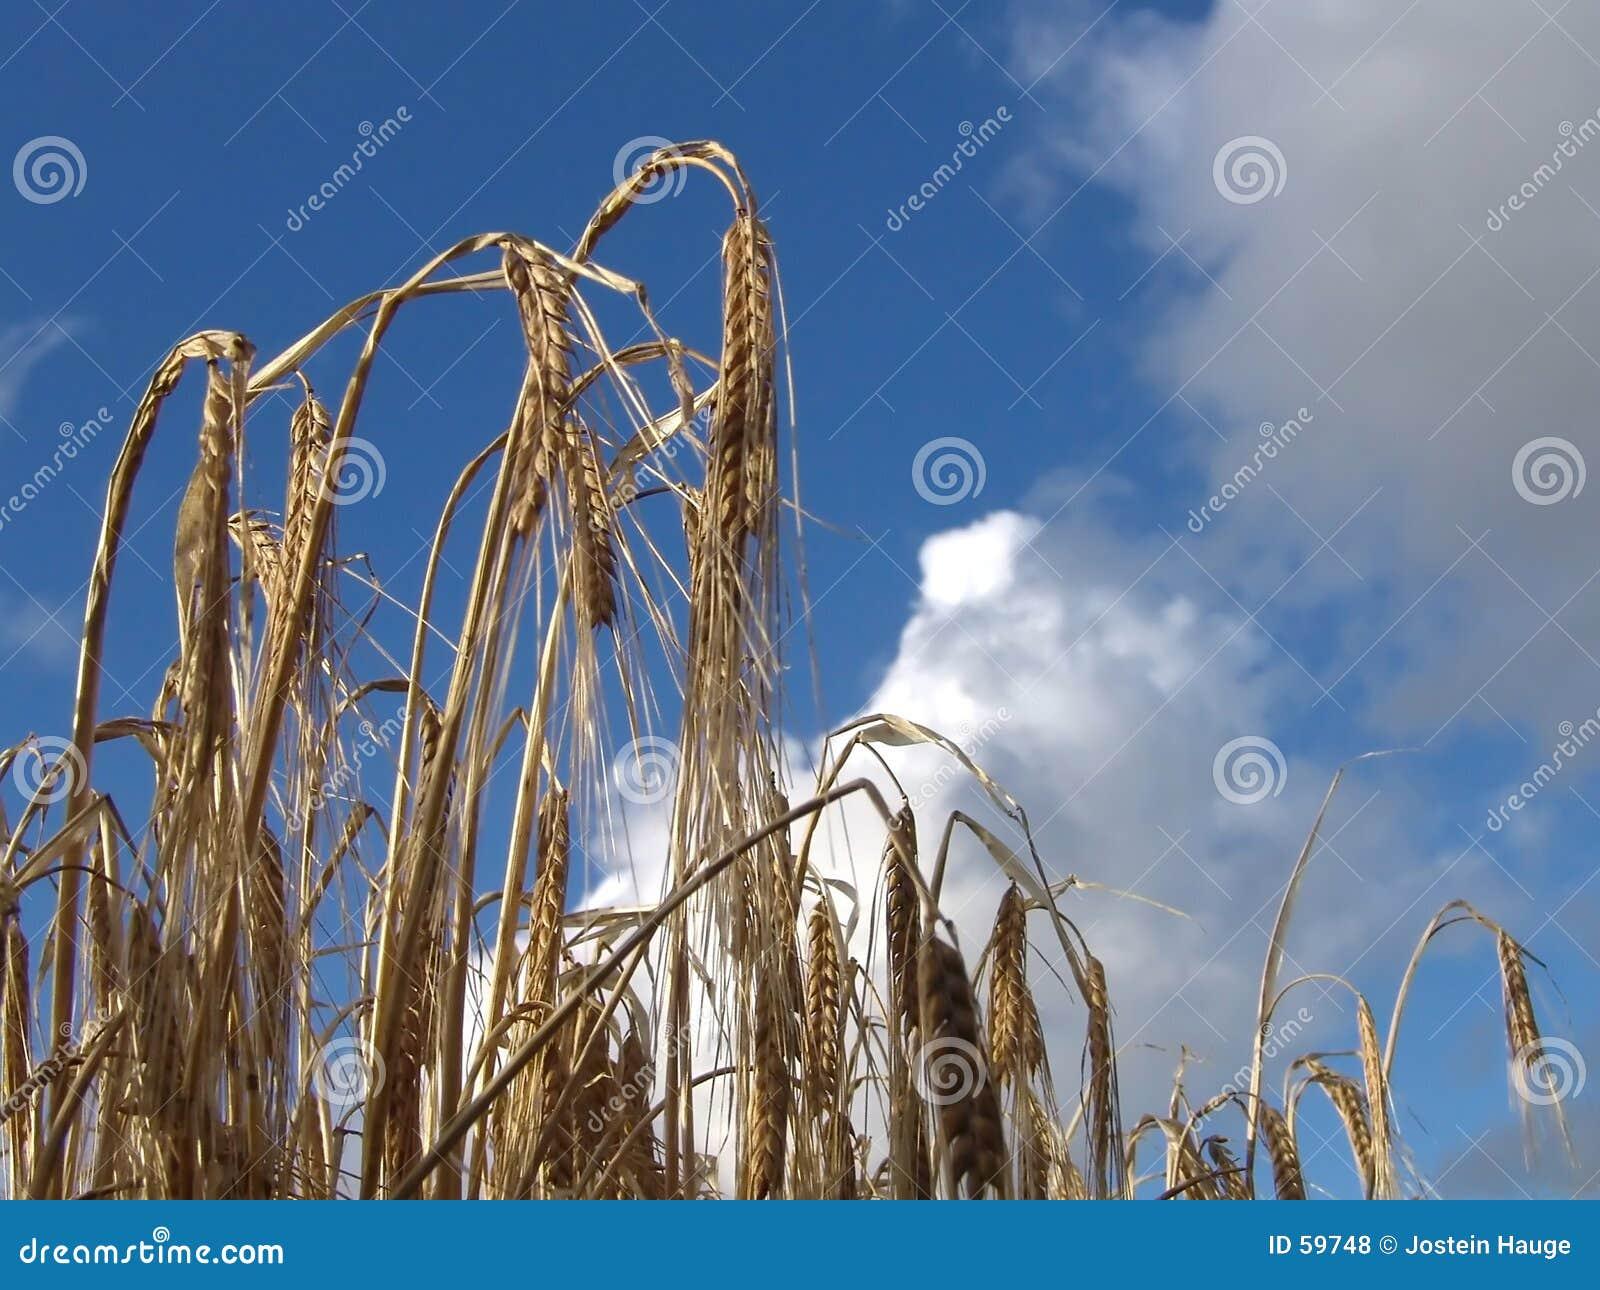 Download ώριμος στοκ εικόνες. εικόνα από φθινοπώρου, ώριμος, φυτά - 59748